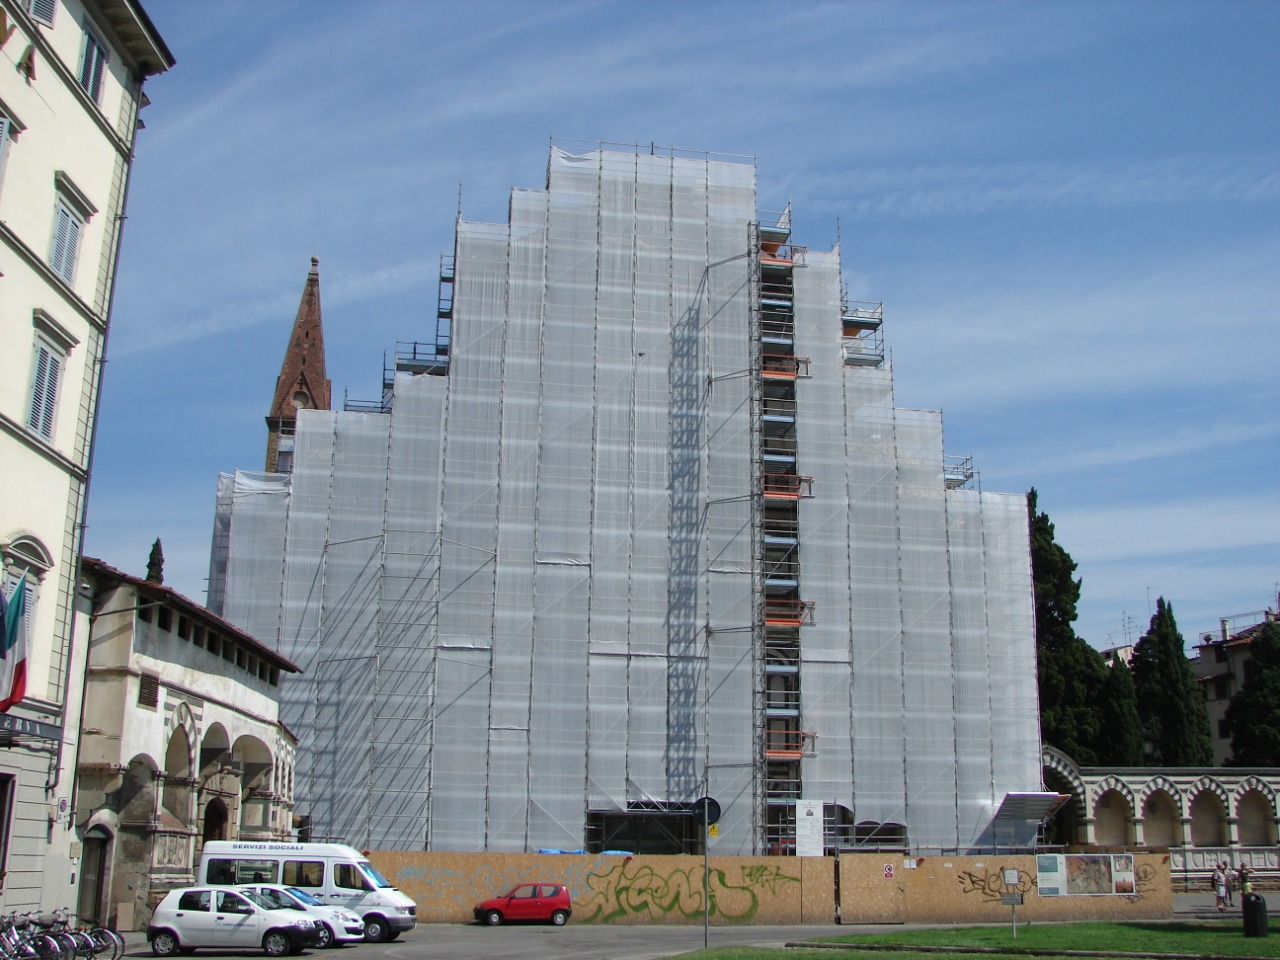 Gallery foto n.1 Multiceta - Restauration de la Basilique S. M. Novella